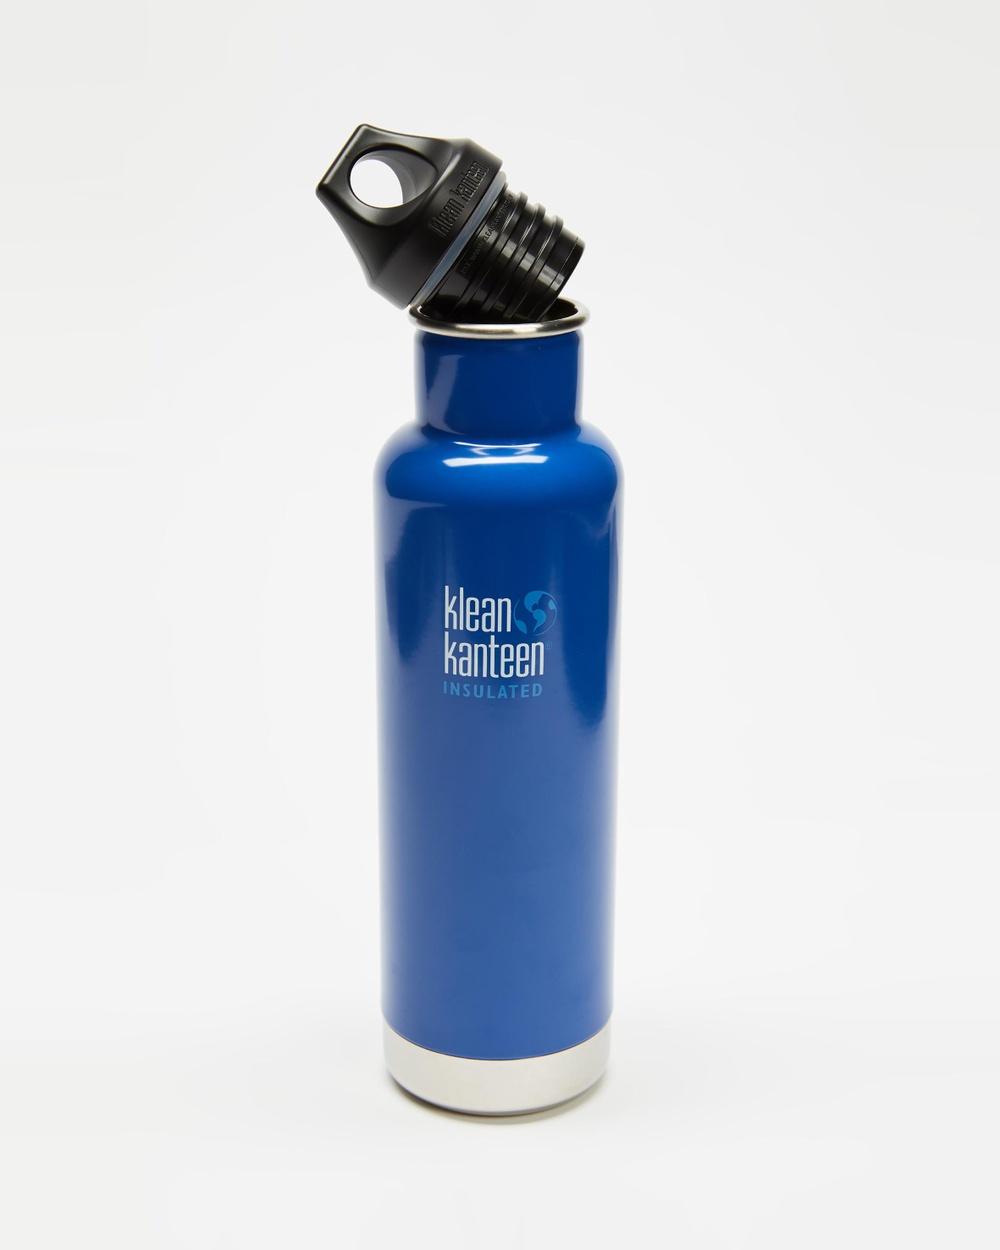 Klean Kanteen 20oz Insulated Classic Loop Bottle Running Coastal Waters